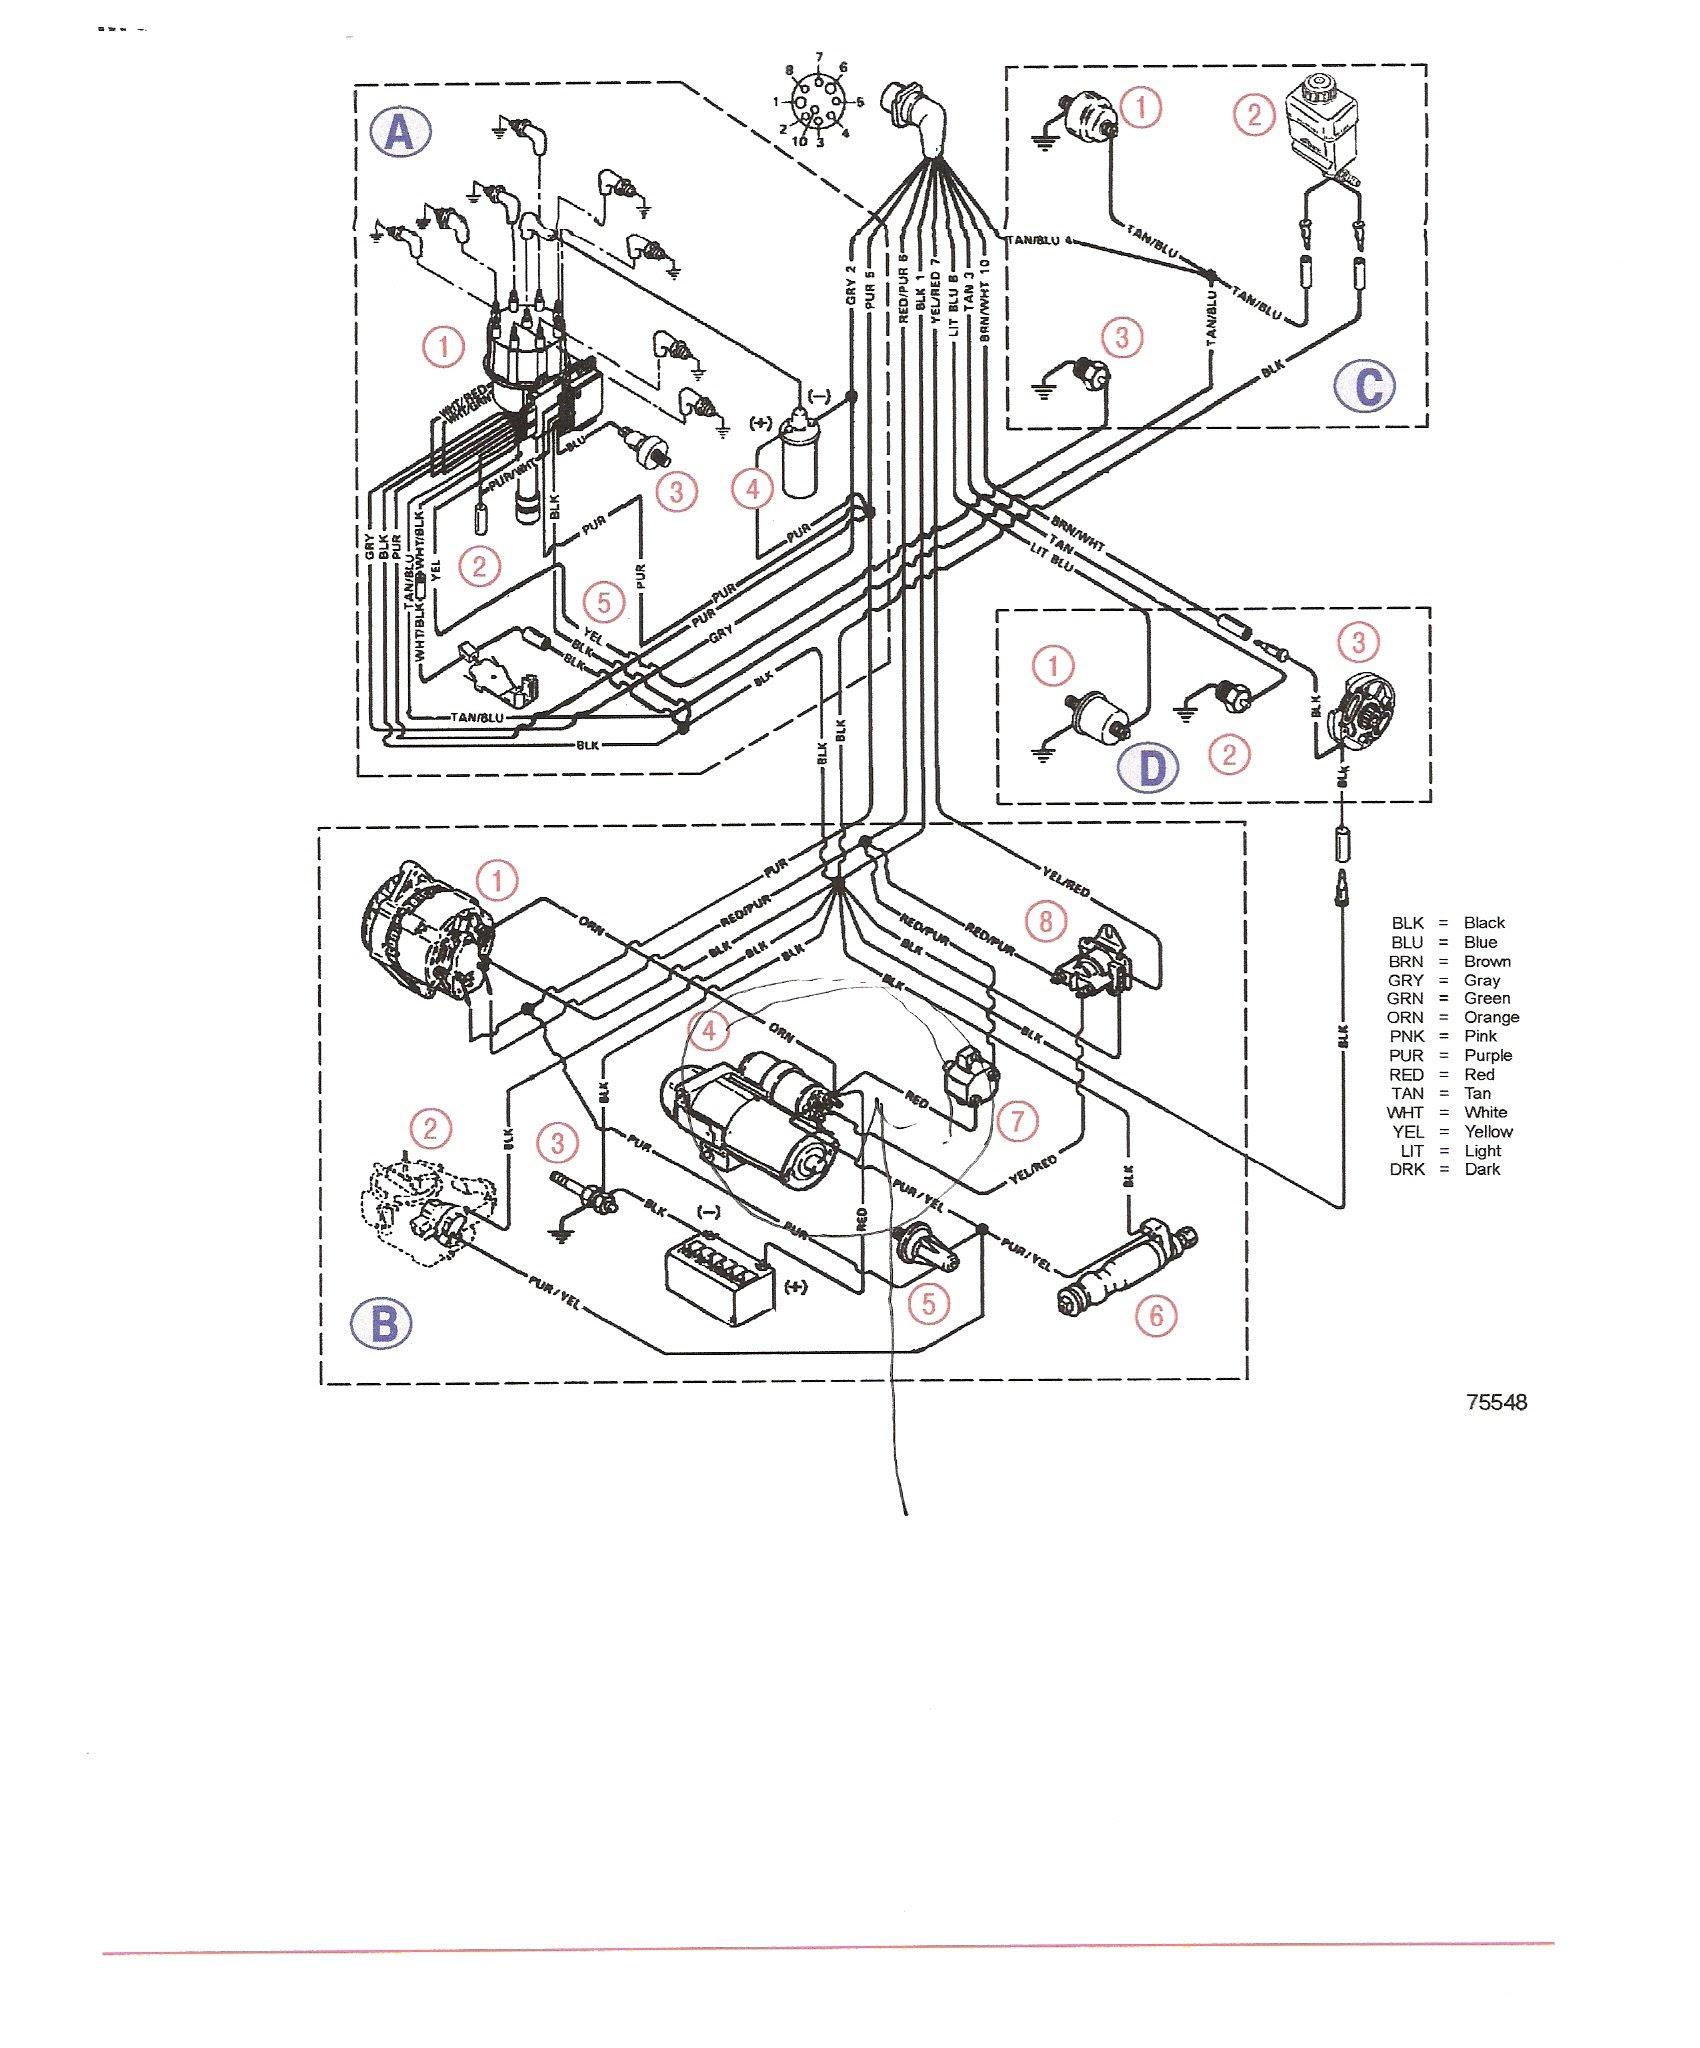 Diagram 1988 Bayliner Center Console Wiring Diagram Full Version Hd Quality Wiring Diagram Stoneswiring2k Atuttasosta It